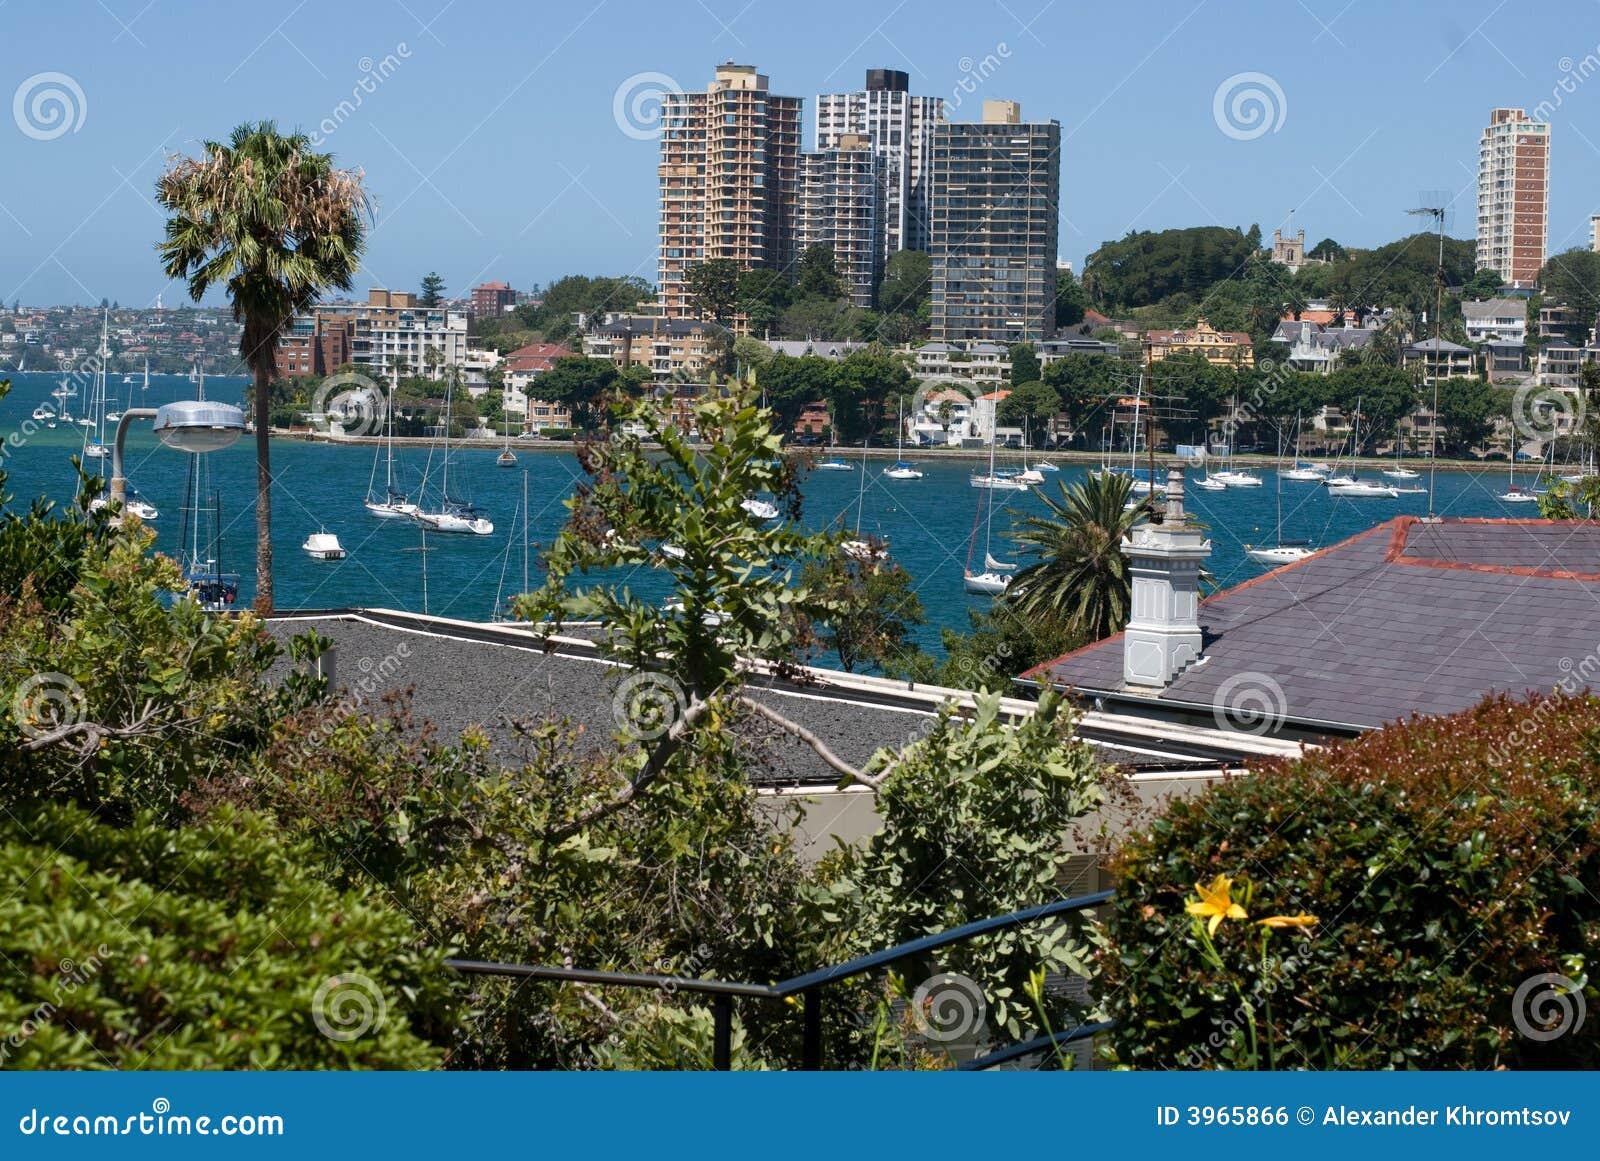 Sydney city seafront